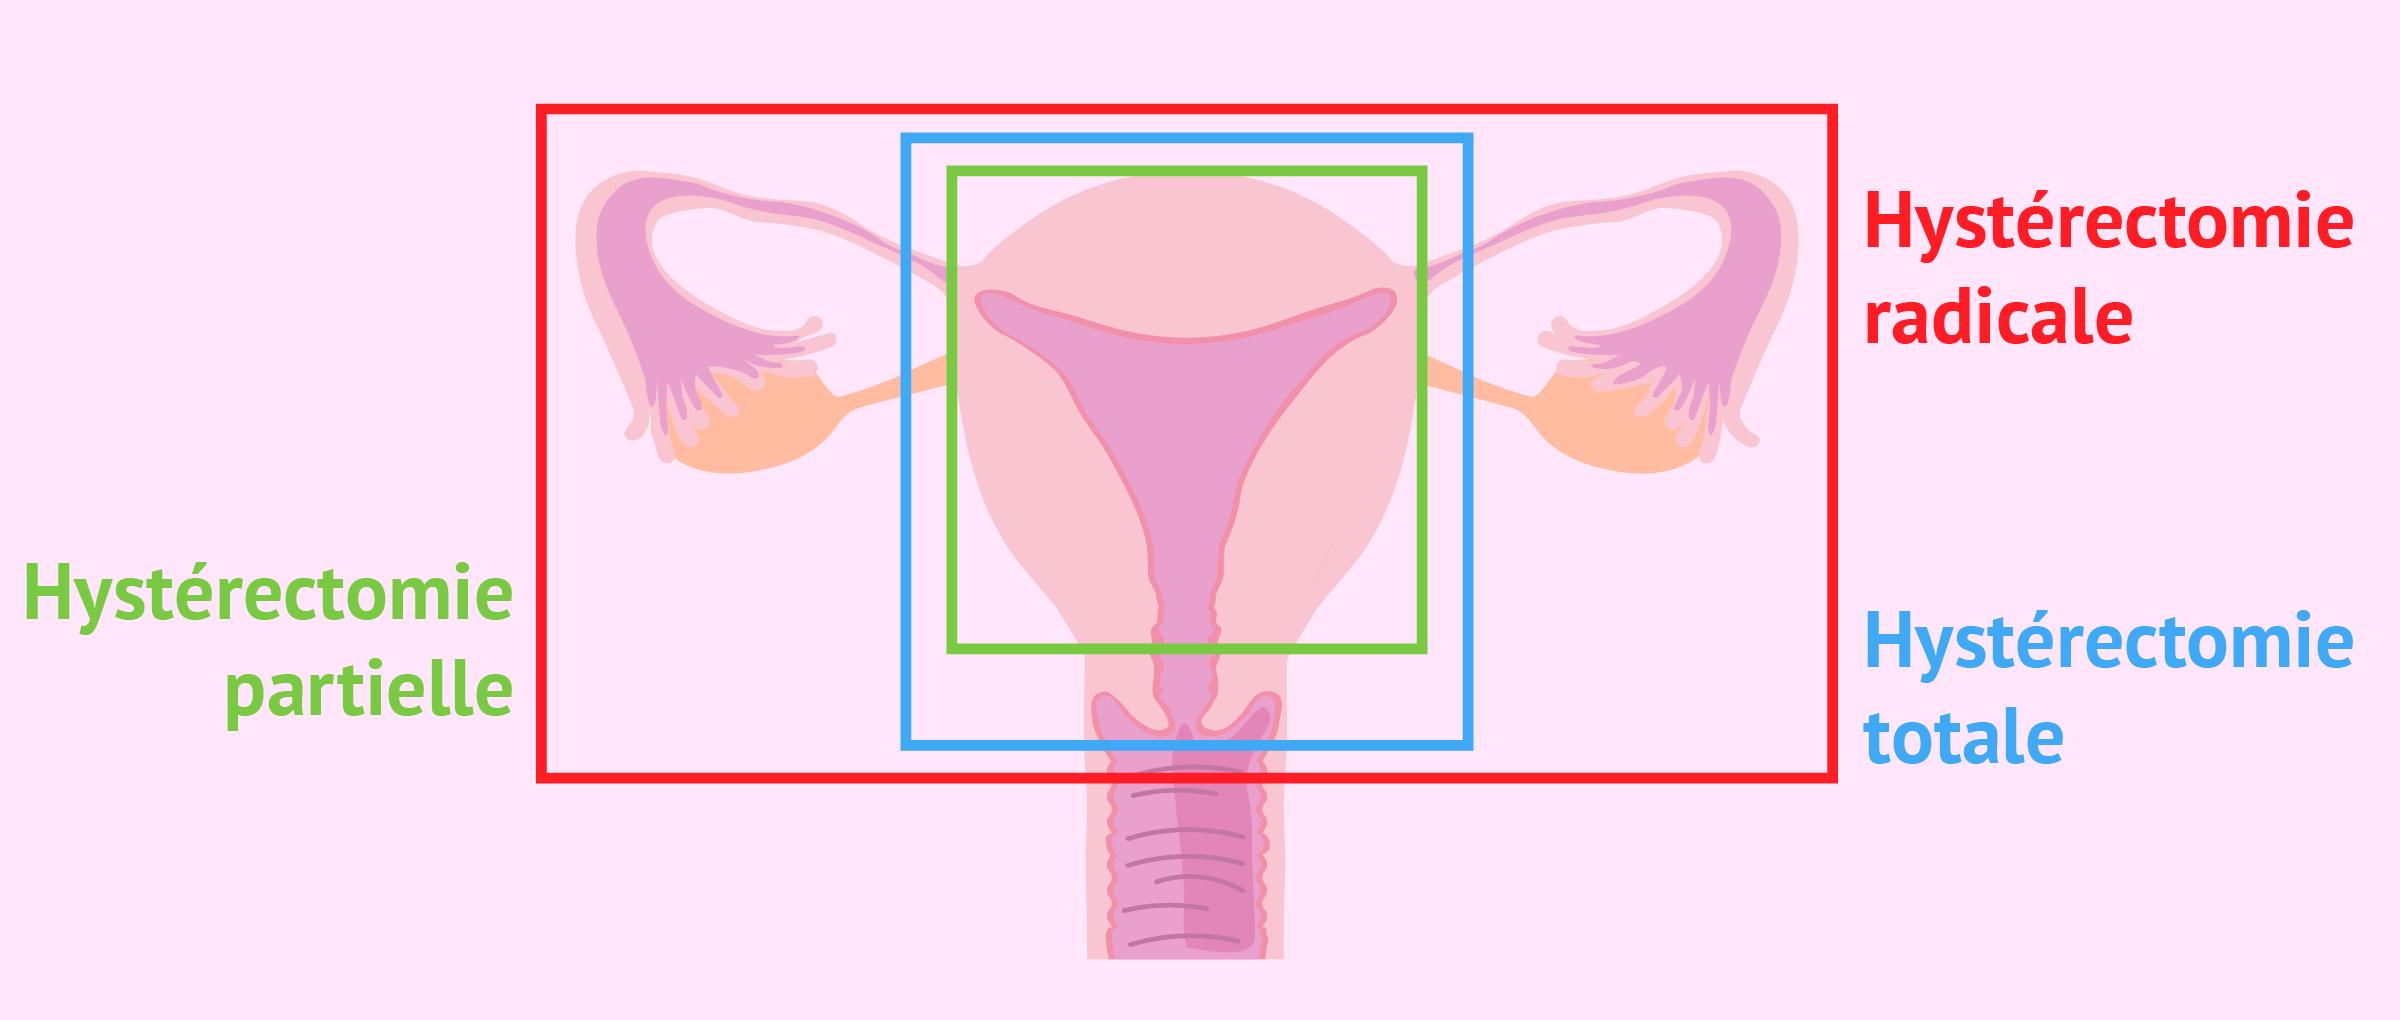 Types d'hystérectomie